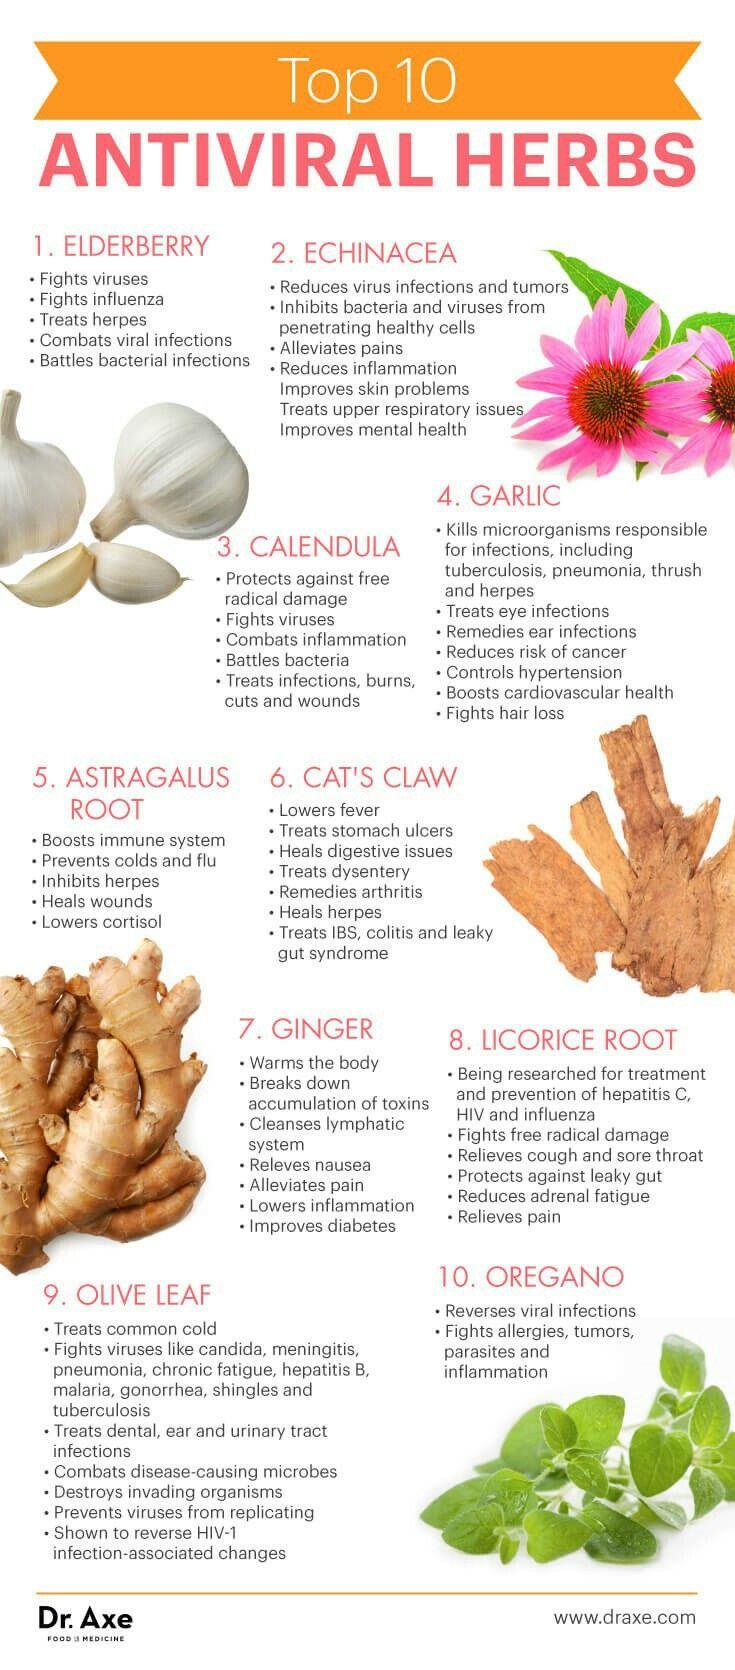 Antiviral Herbs